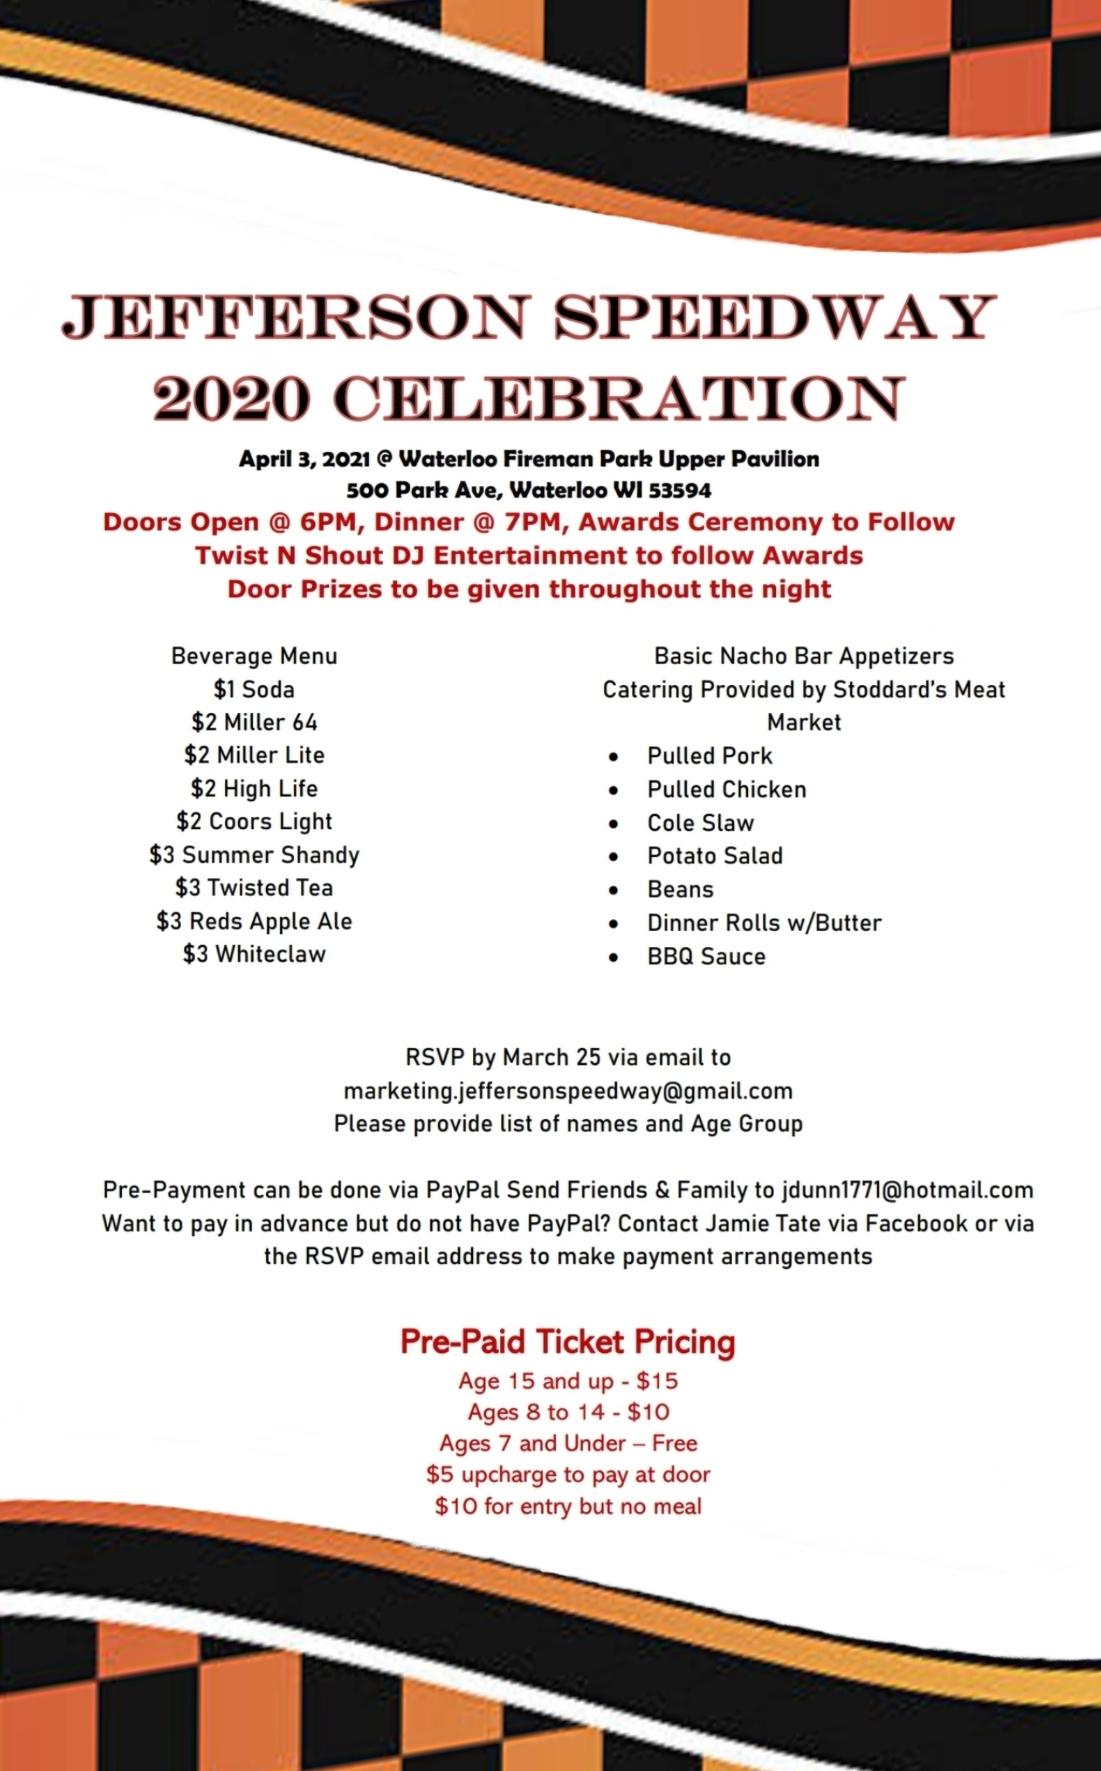 Jefferson Speedway 2020 Celebration